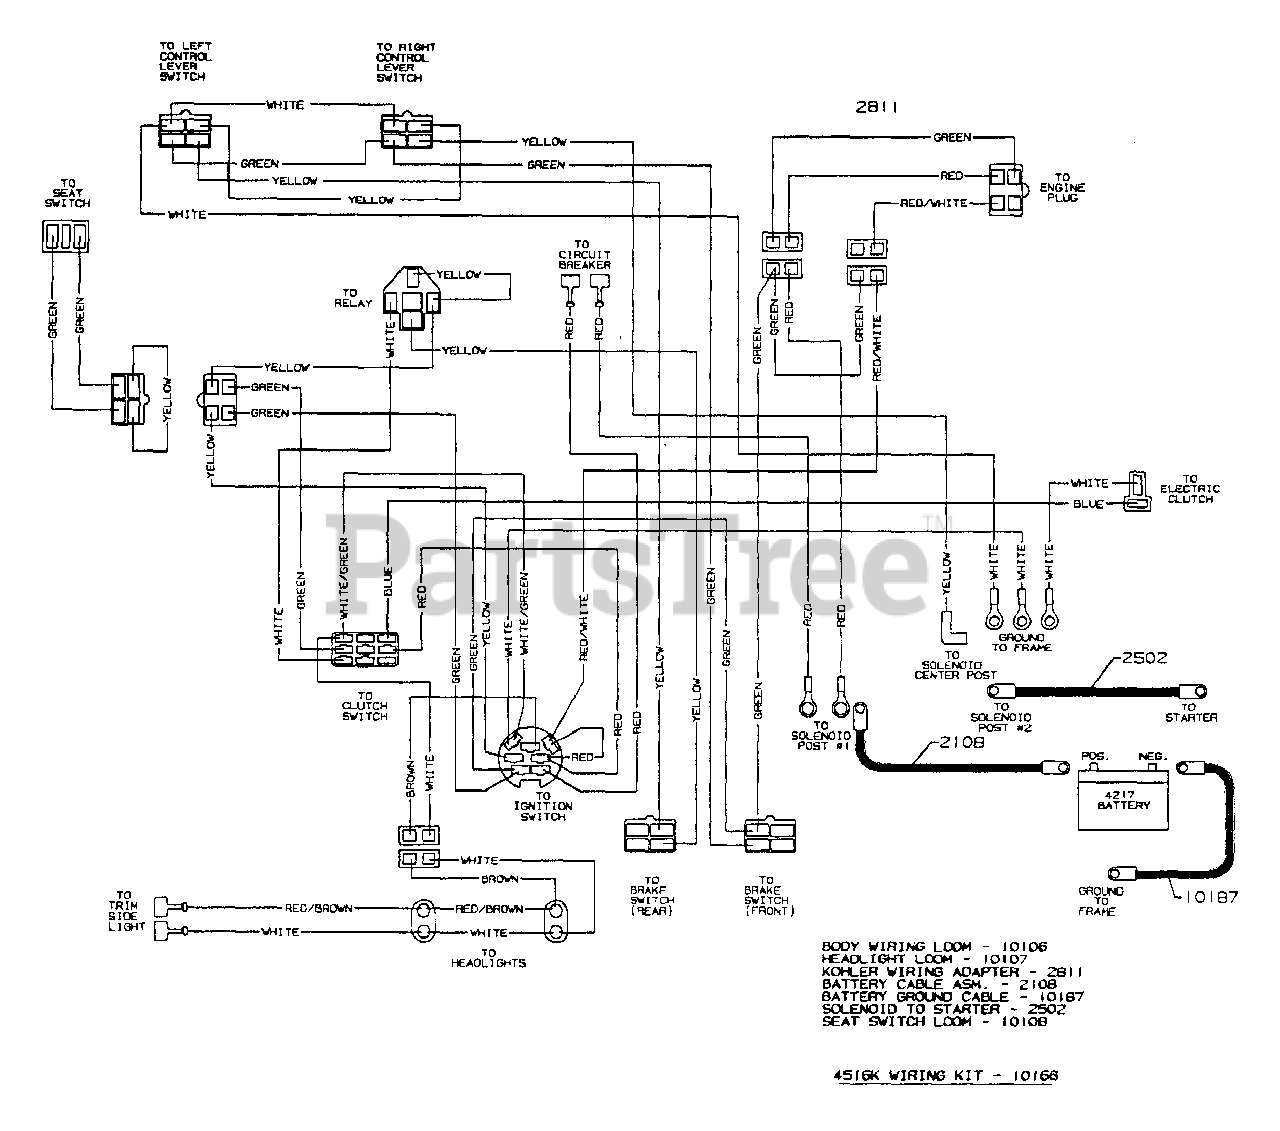 [SCHEMATICS_48IU]  DIAGRAM] Kubota Diesel Zero Turn Mowers Wiring Diagram 2002 FULL Version HD  Quality Diagram 2002 - ELECTRICALWIRINGDIAGRAM.MANDEL-GAERTNERS.DE   Kubota Diesel Zero Turn Mowers Wiring Diagram 2002      Diagram Database